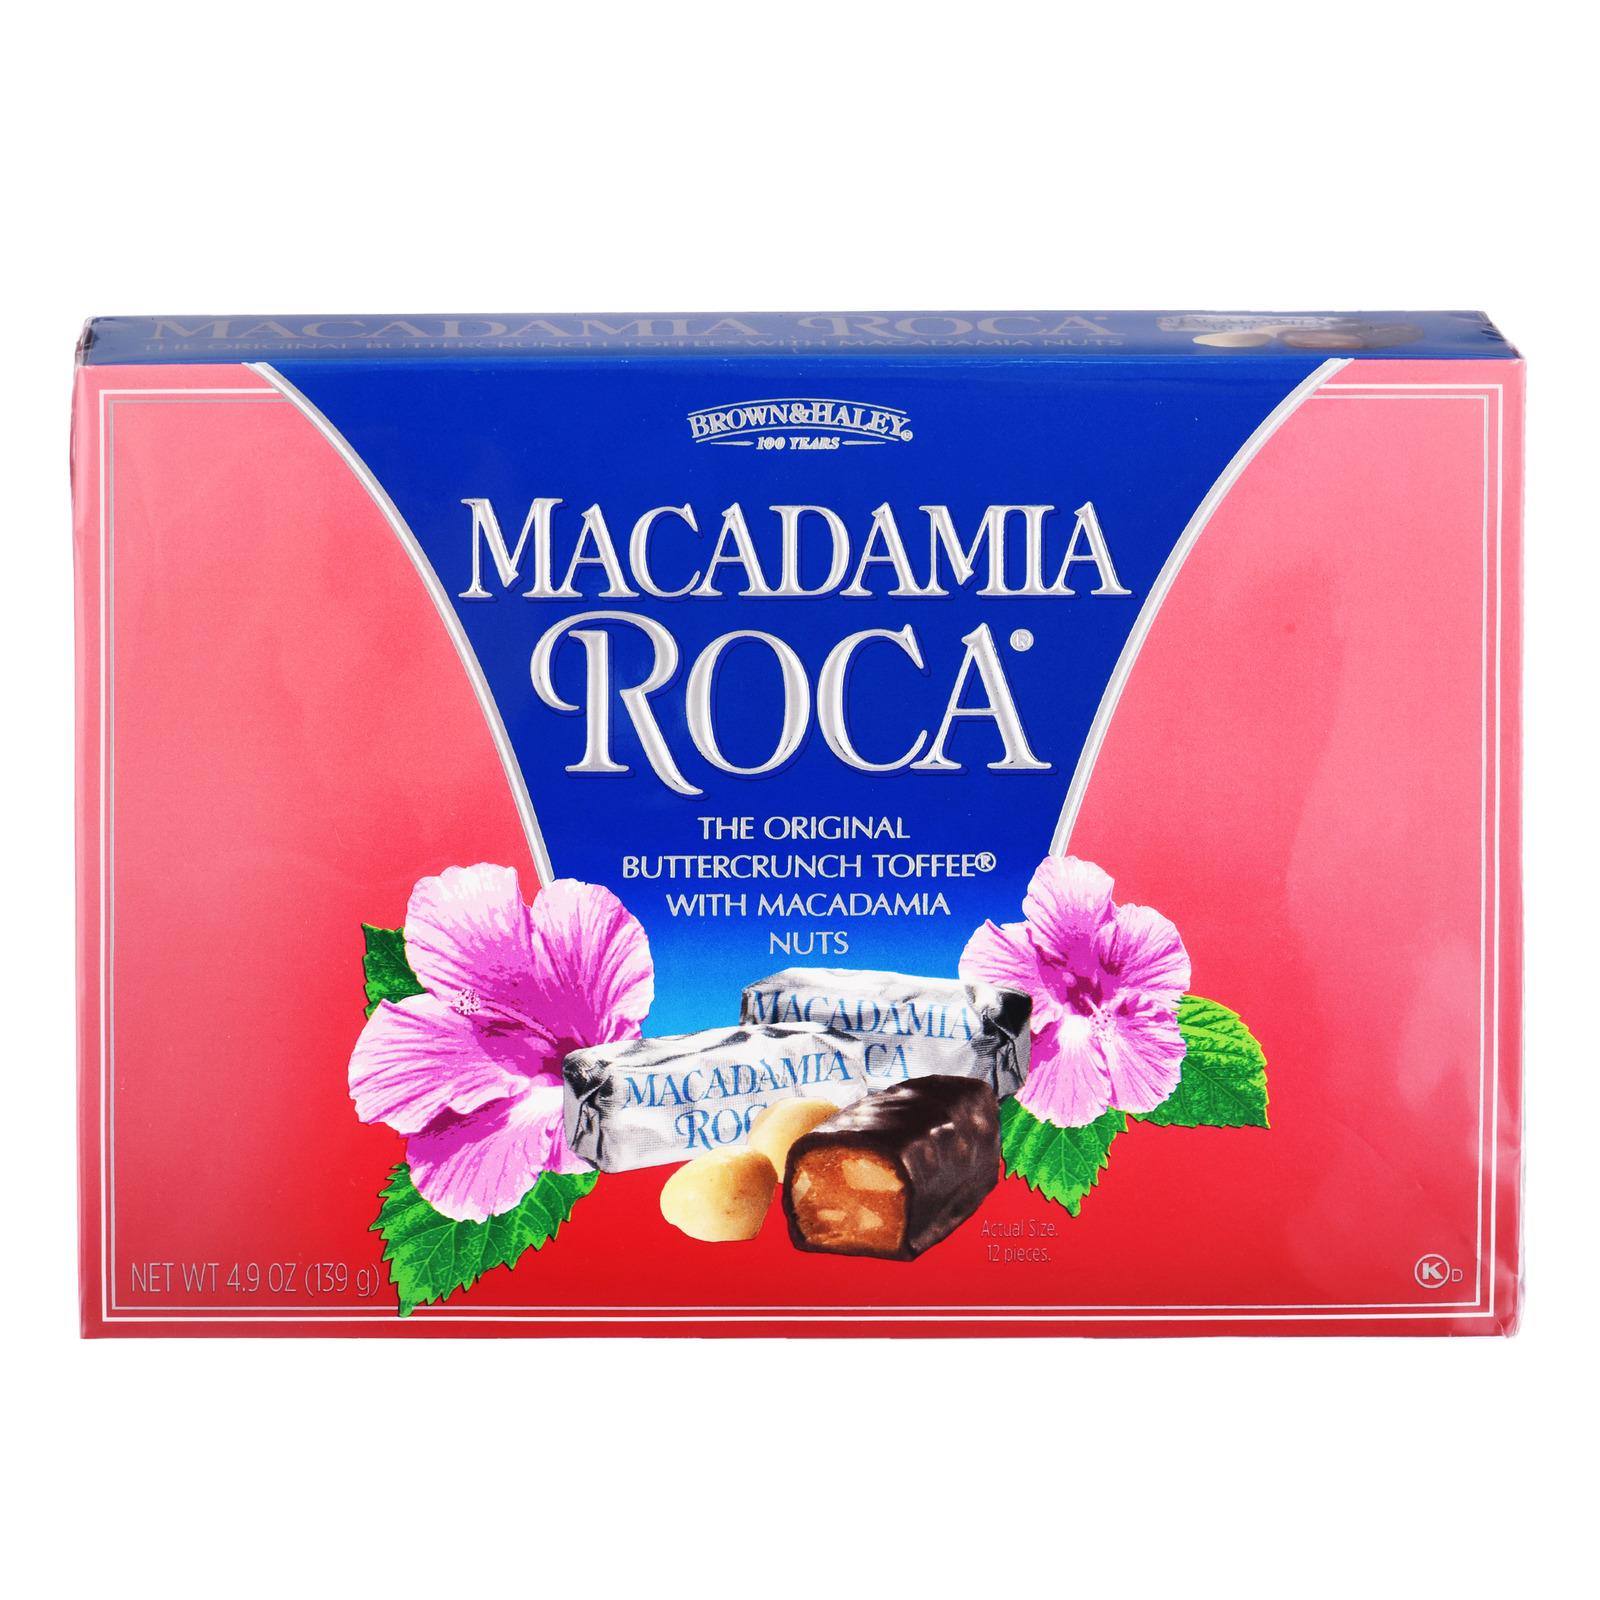 Brown & Haley Buttercrunch Toffee - Macadamia Roca